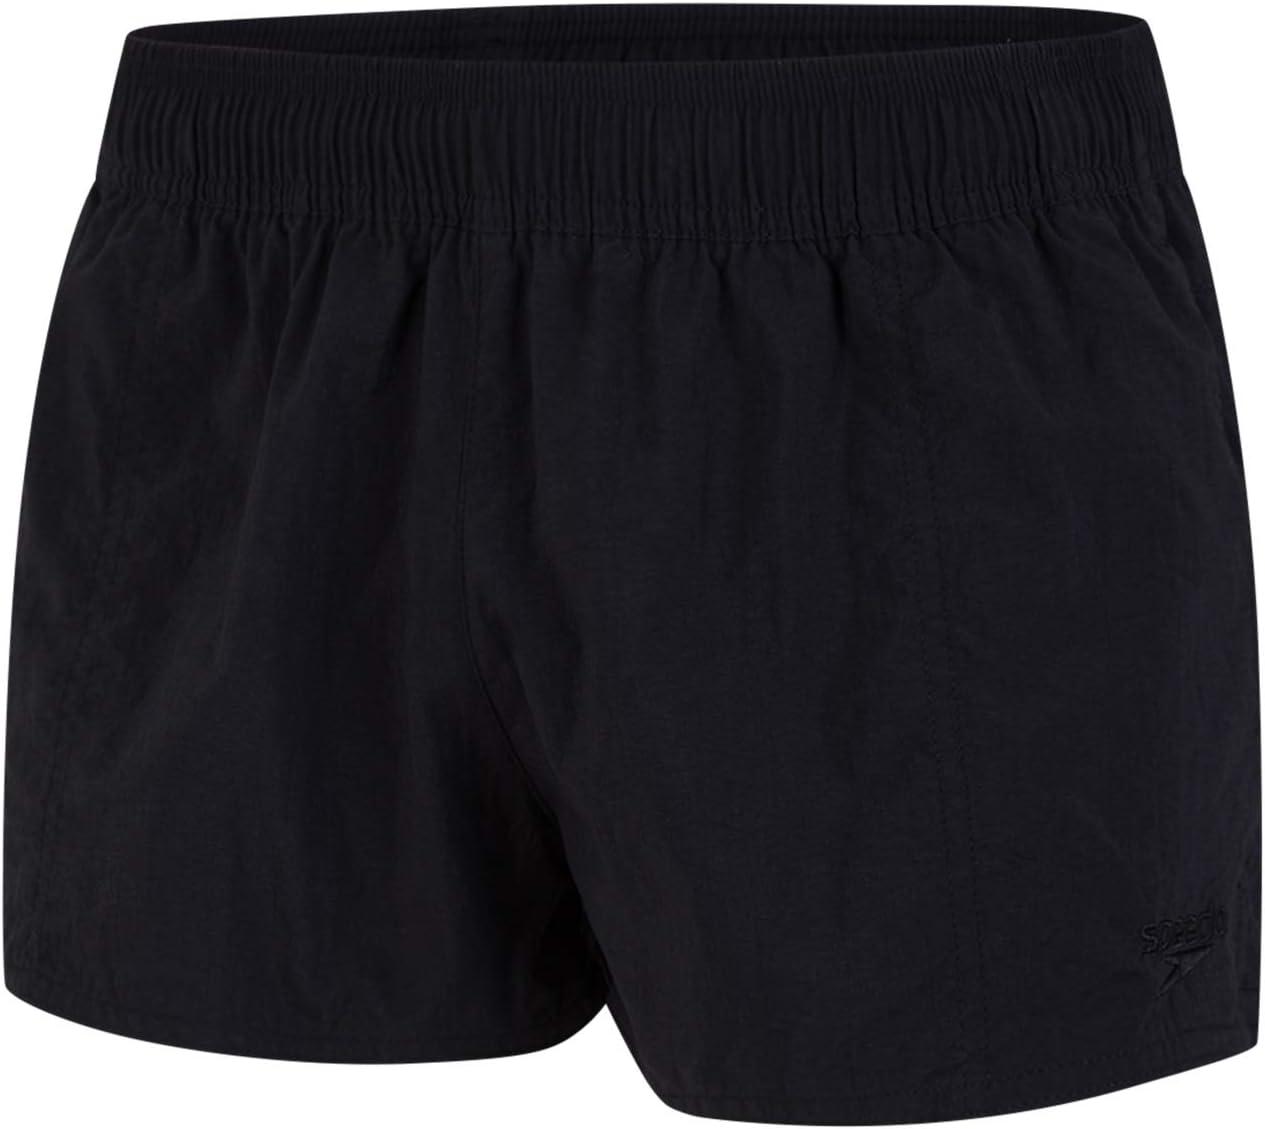 Speedo Womens Essential Swim Short